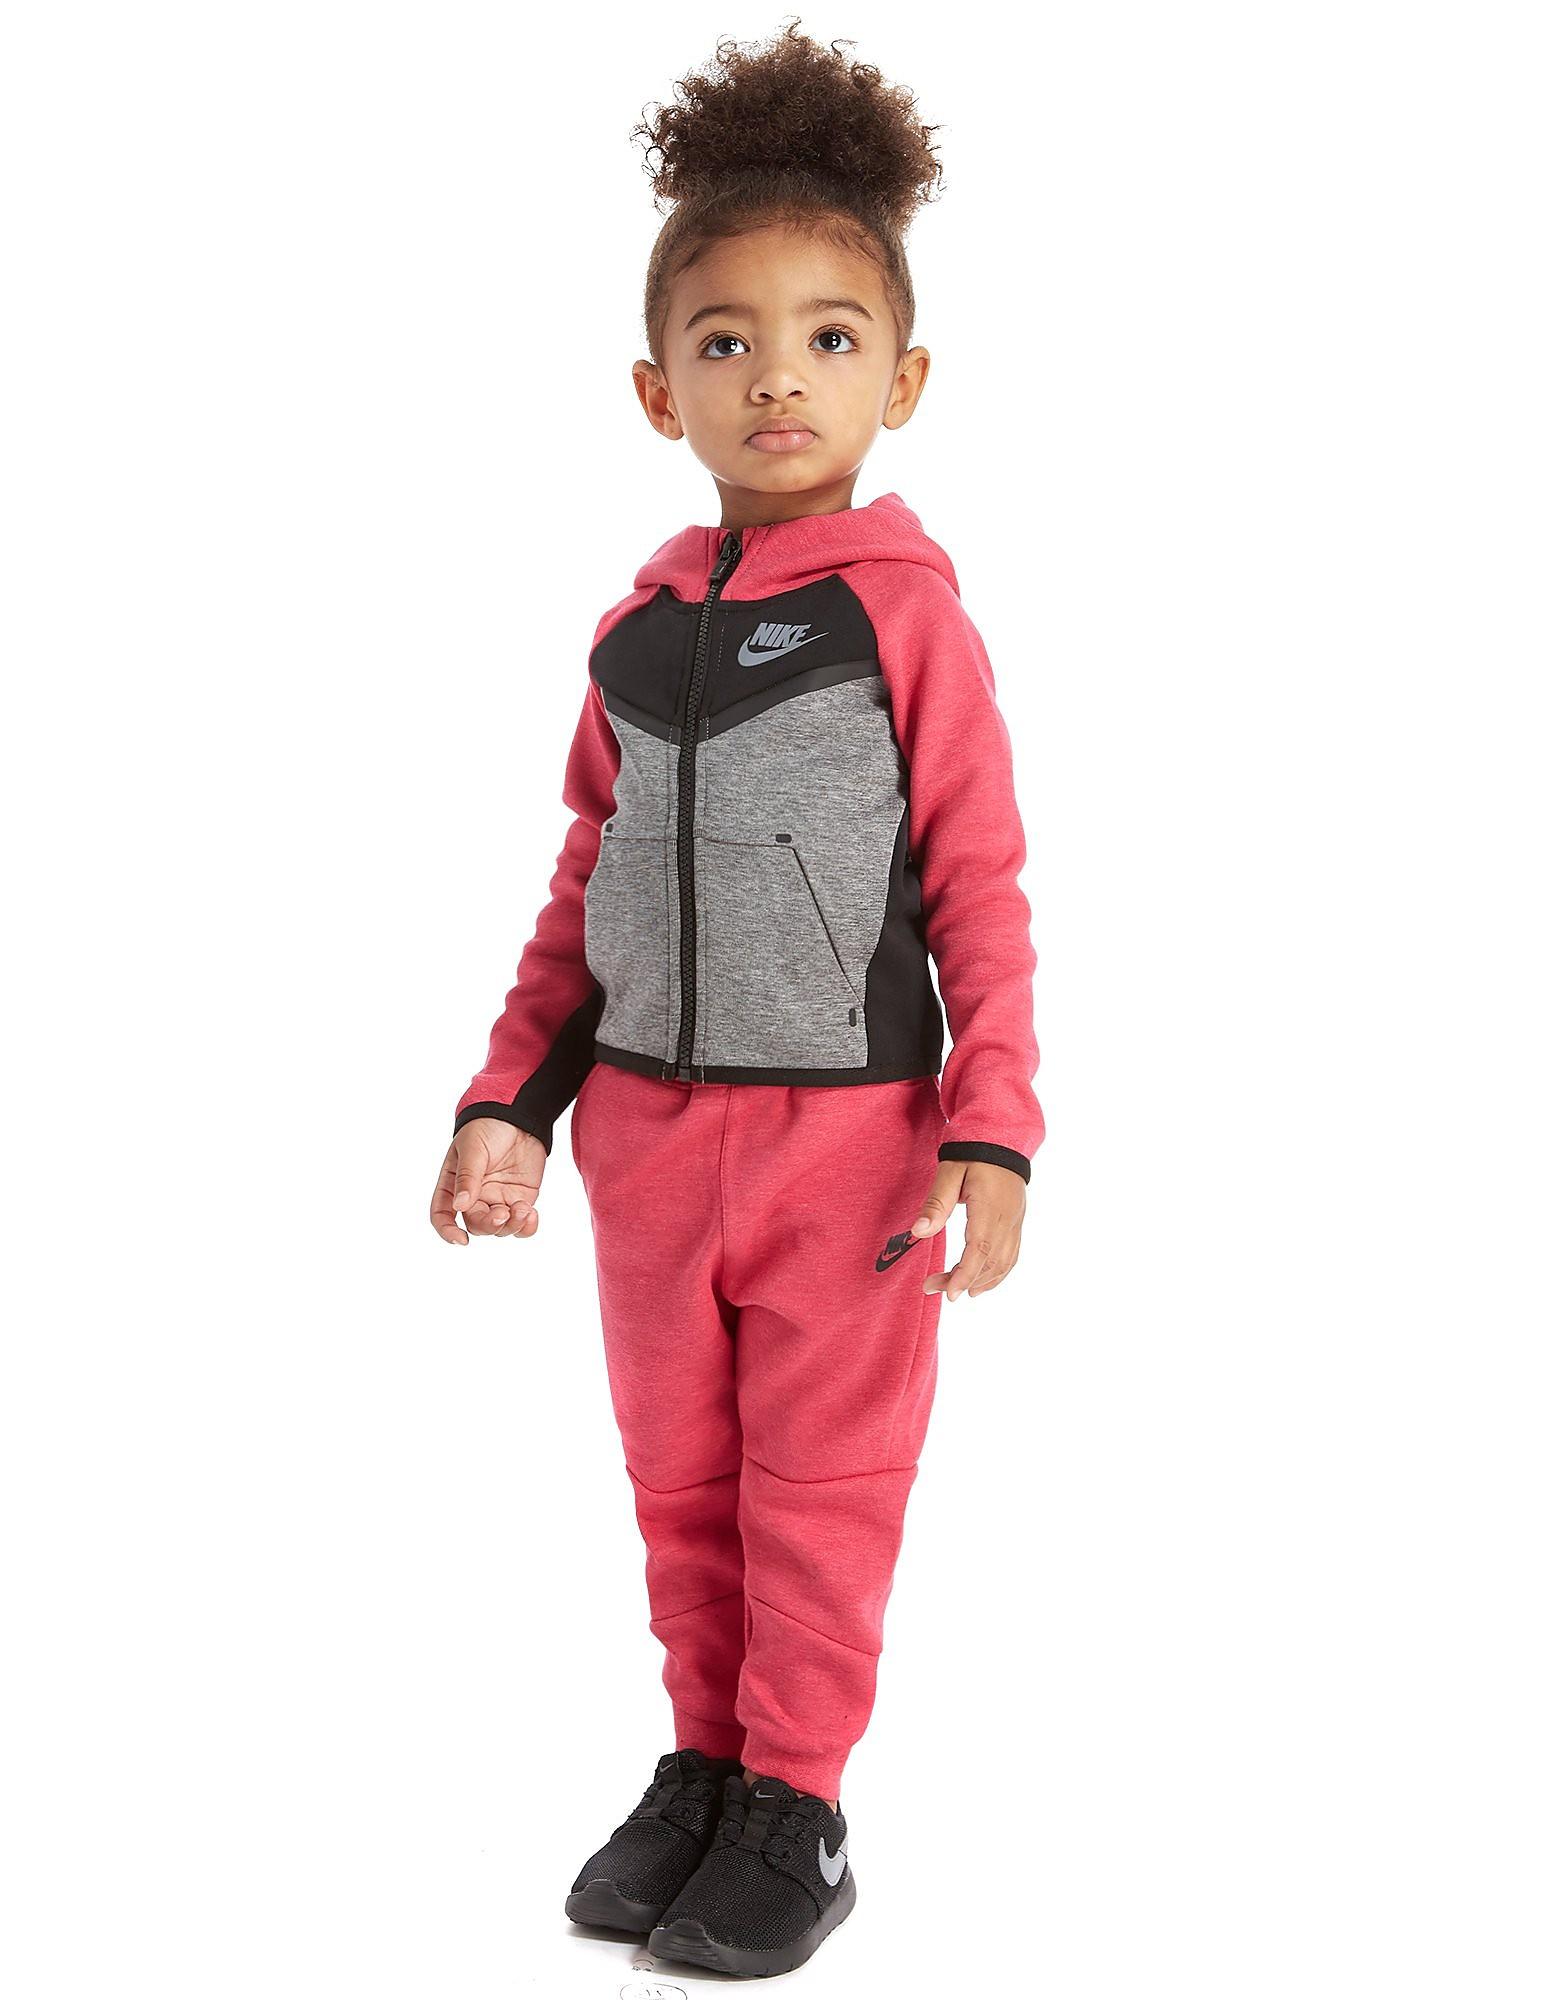 Nike Girls' Tech Fleece Set Infant